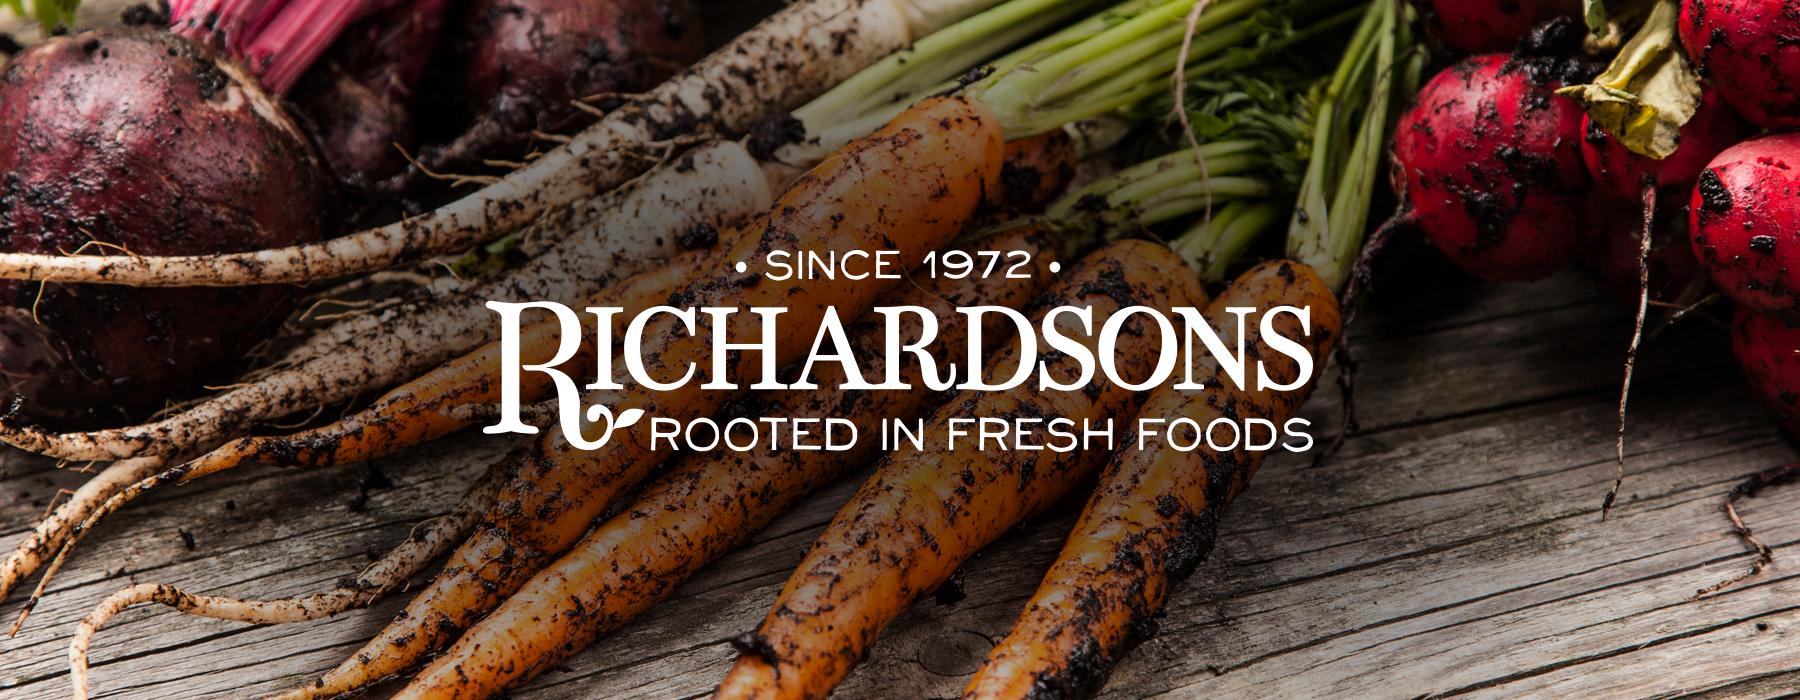 Richardsons Foods Brand Identity